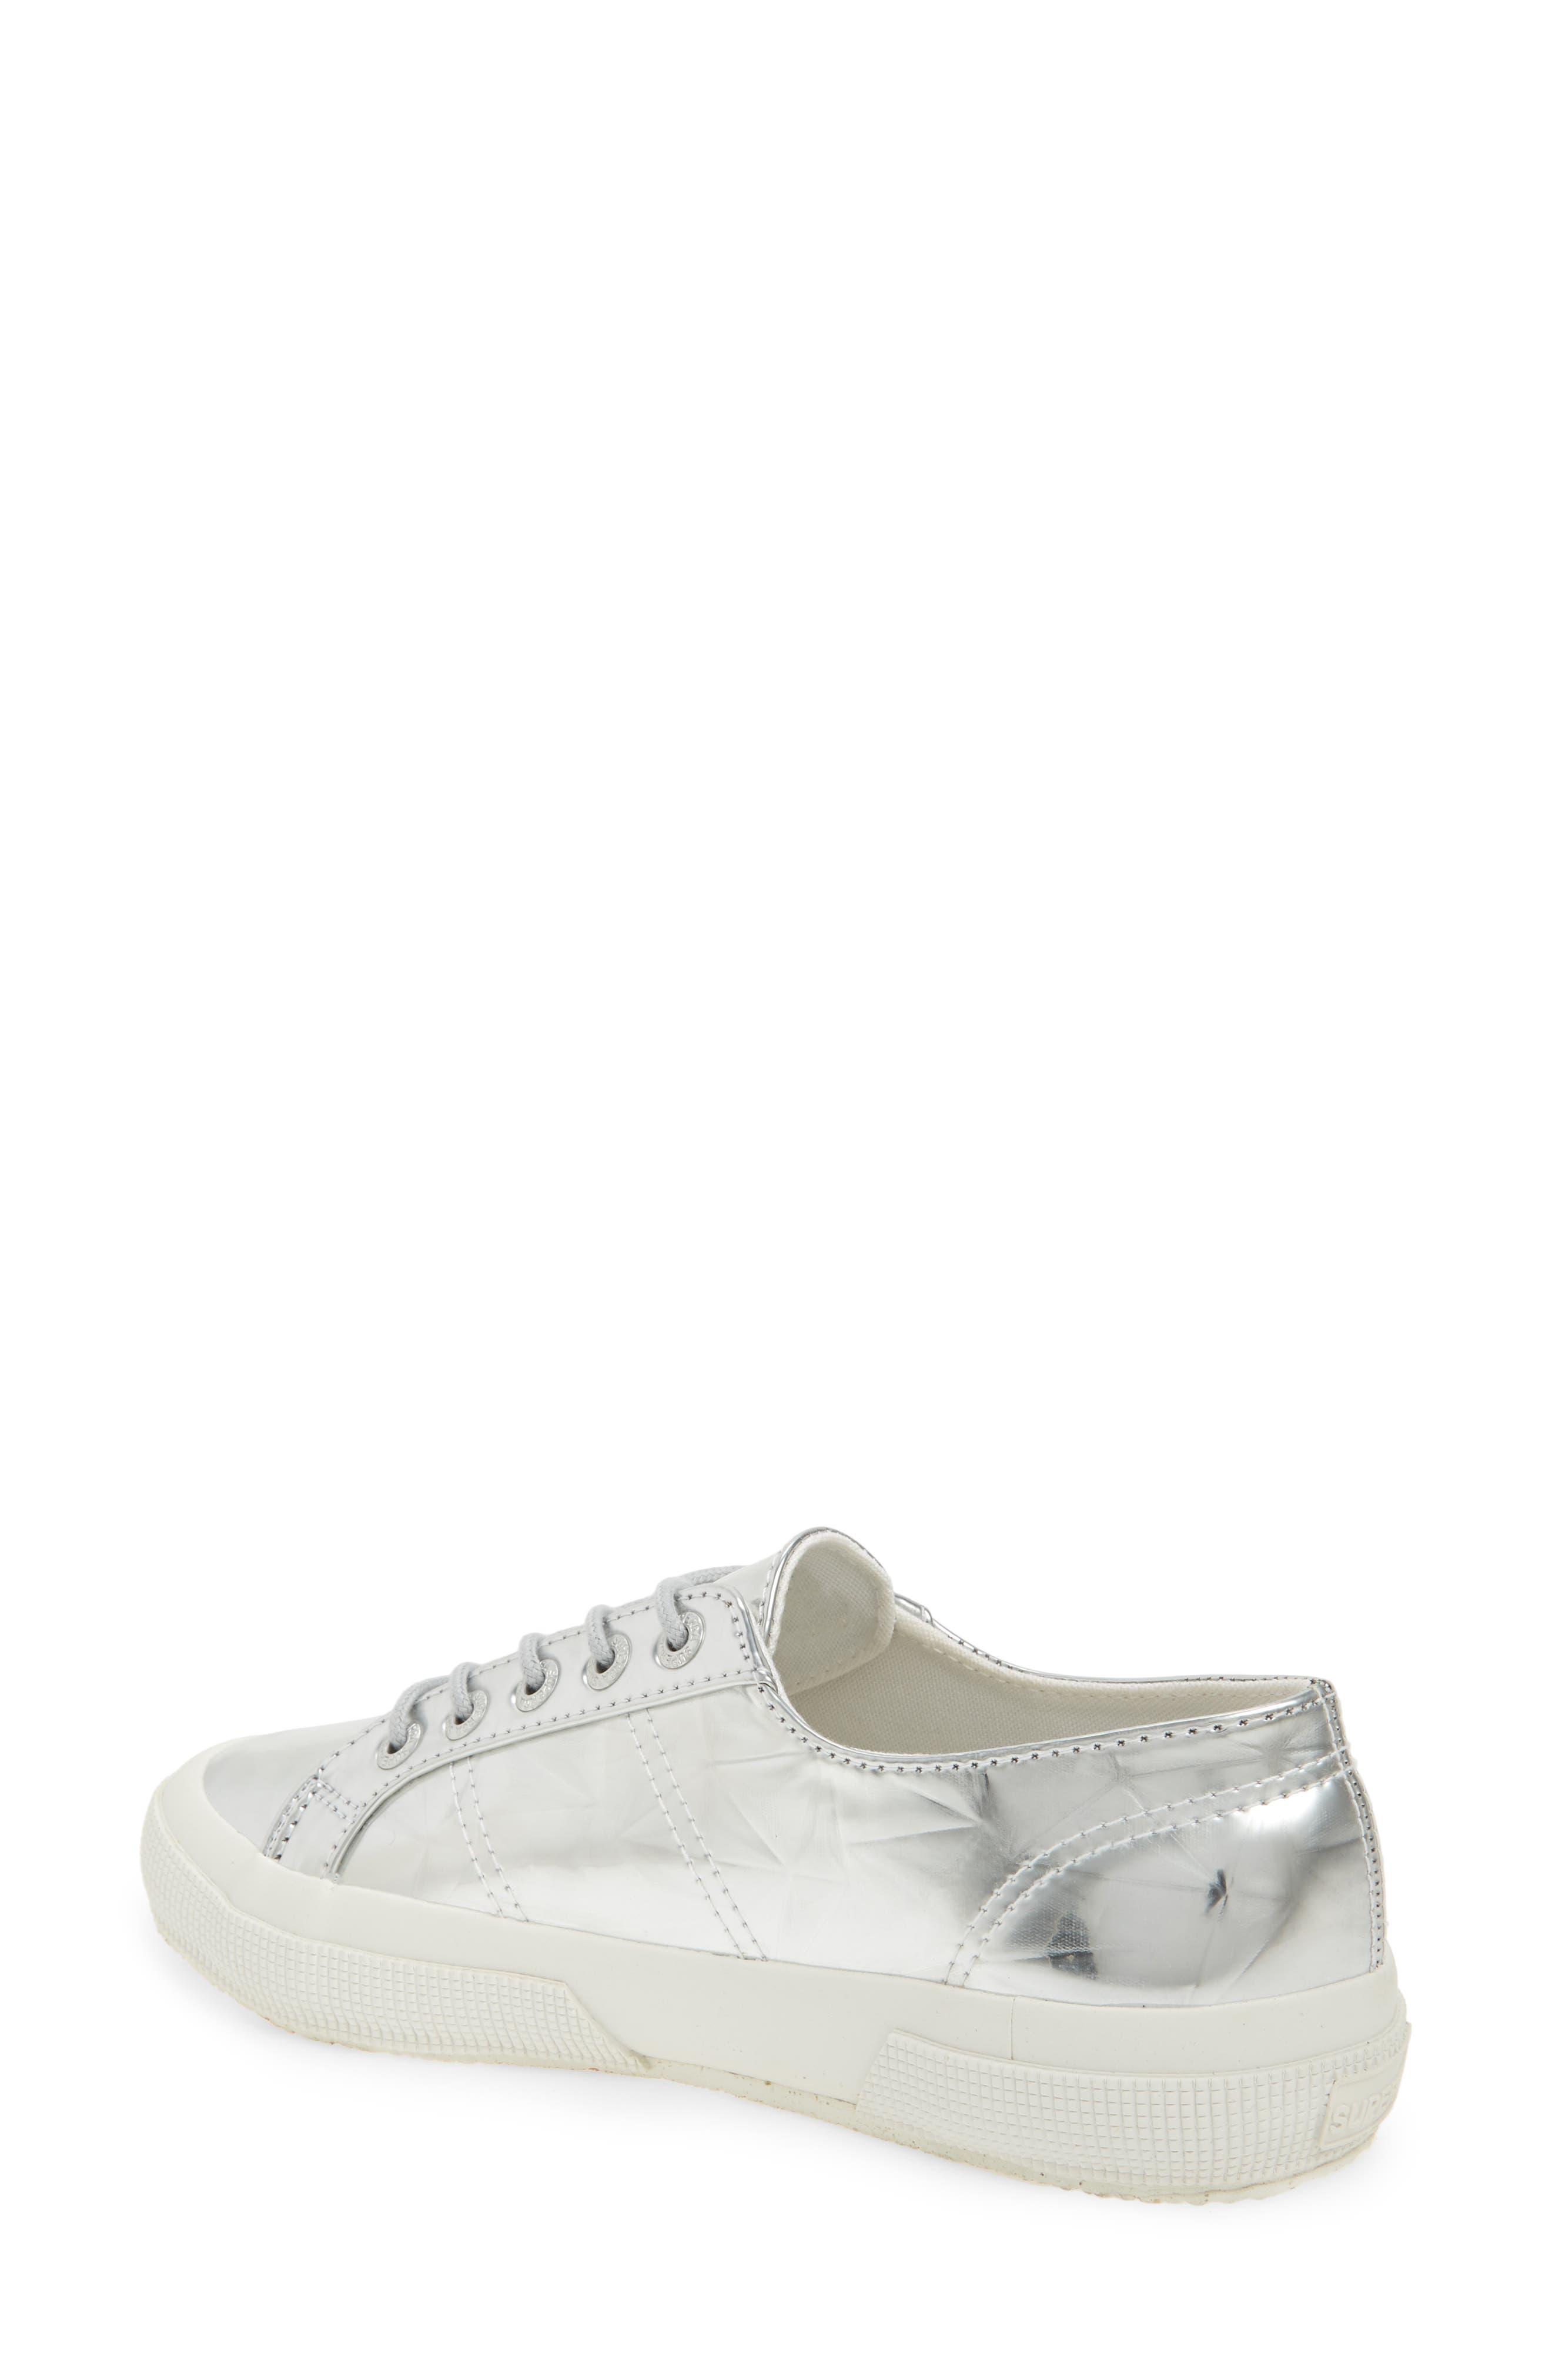 2750 Synleadiamondmirror Sneaker,                             Alternate thumbnail 2, color,                             040